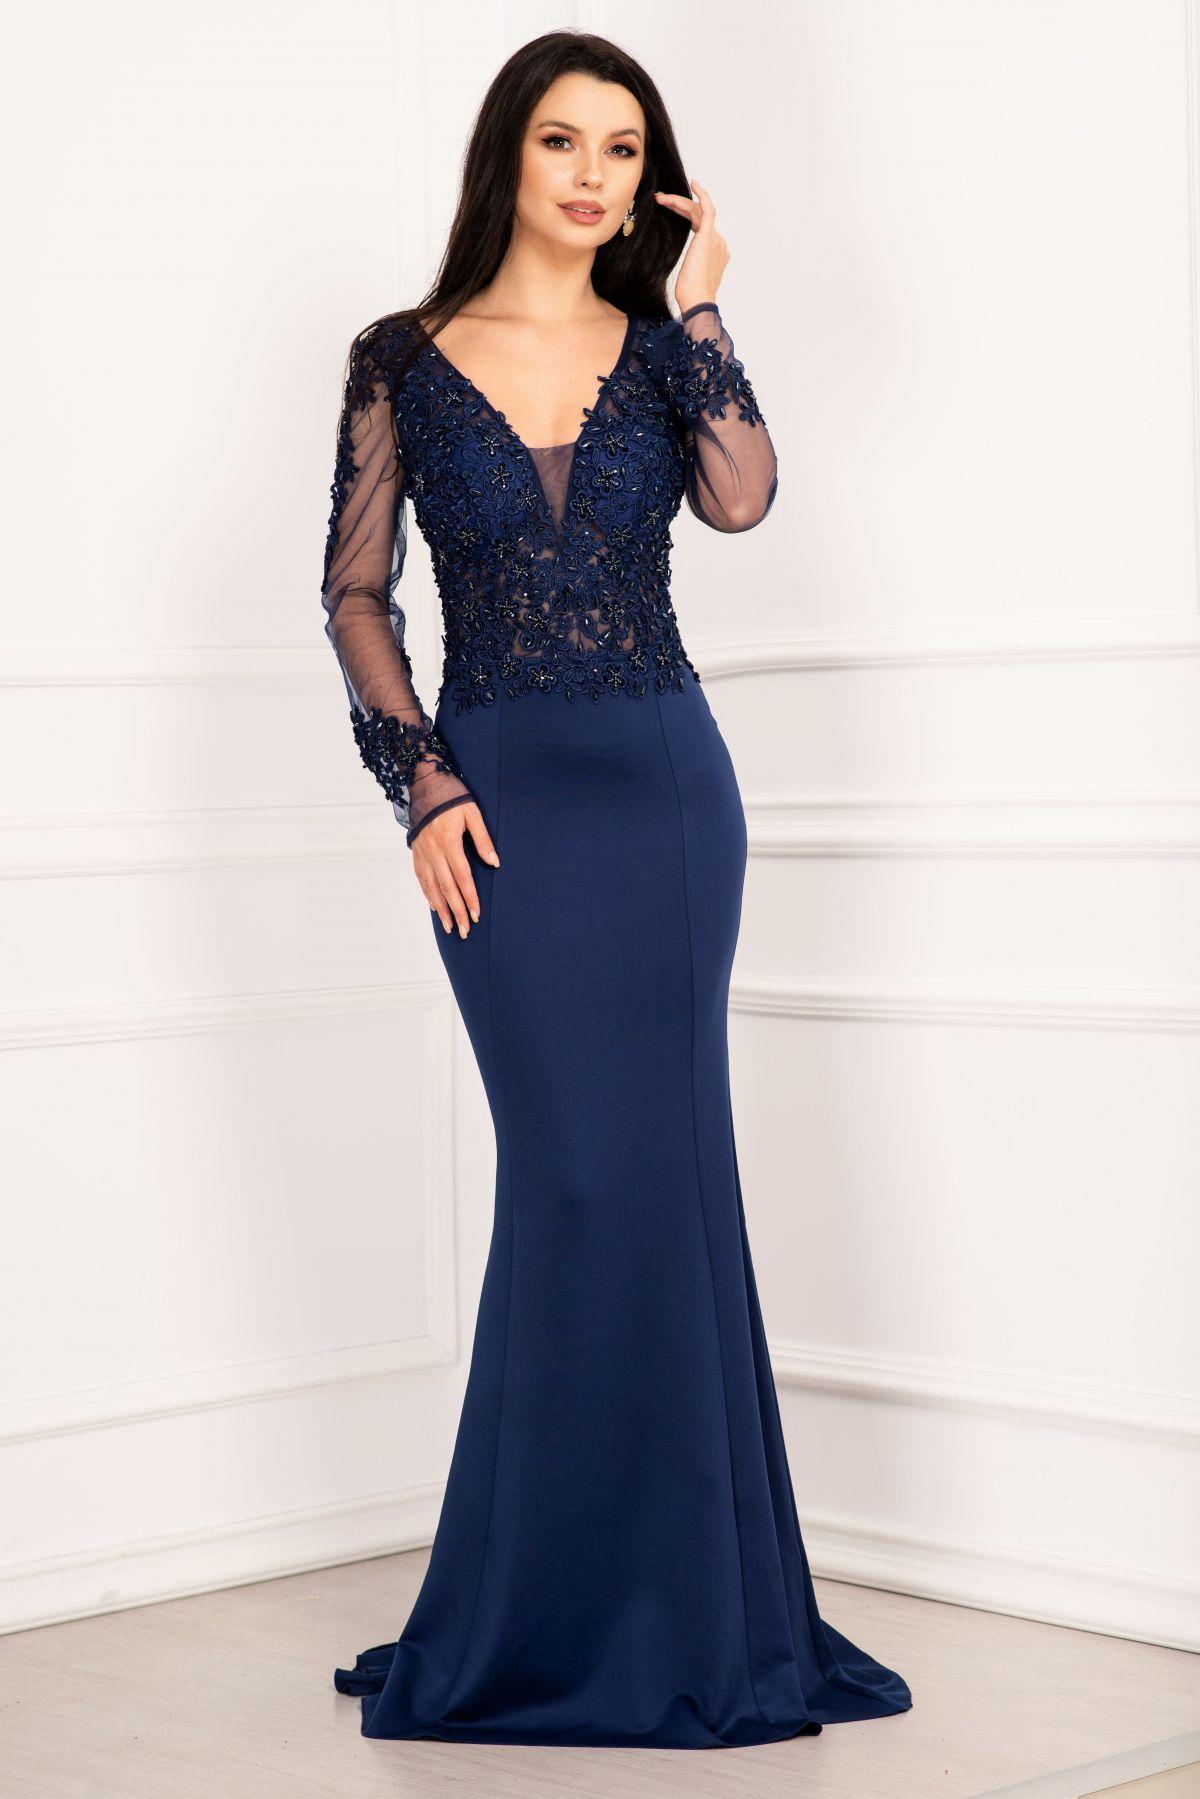 Rochie de seara bleumarin pretioasa tip sirena cu broderie aplicata si margele